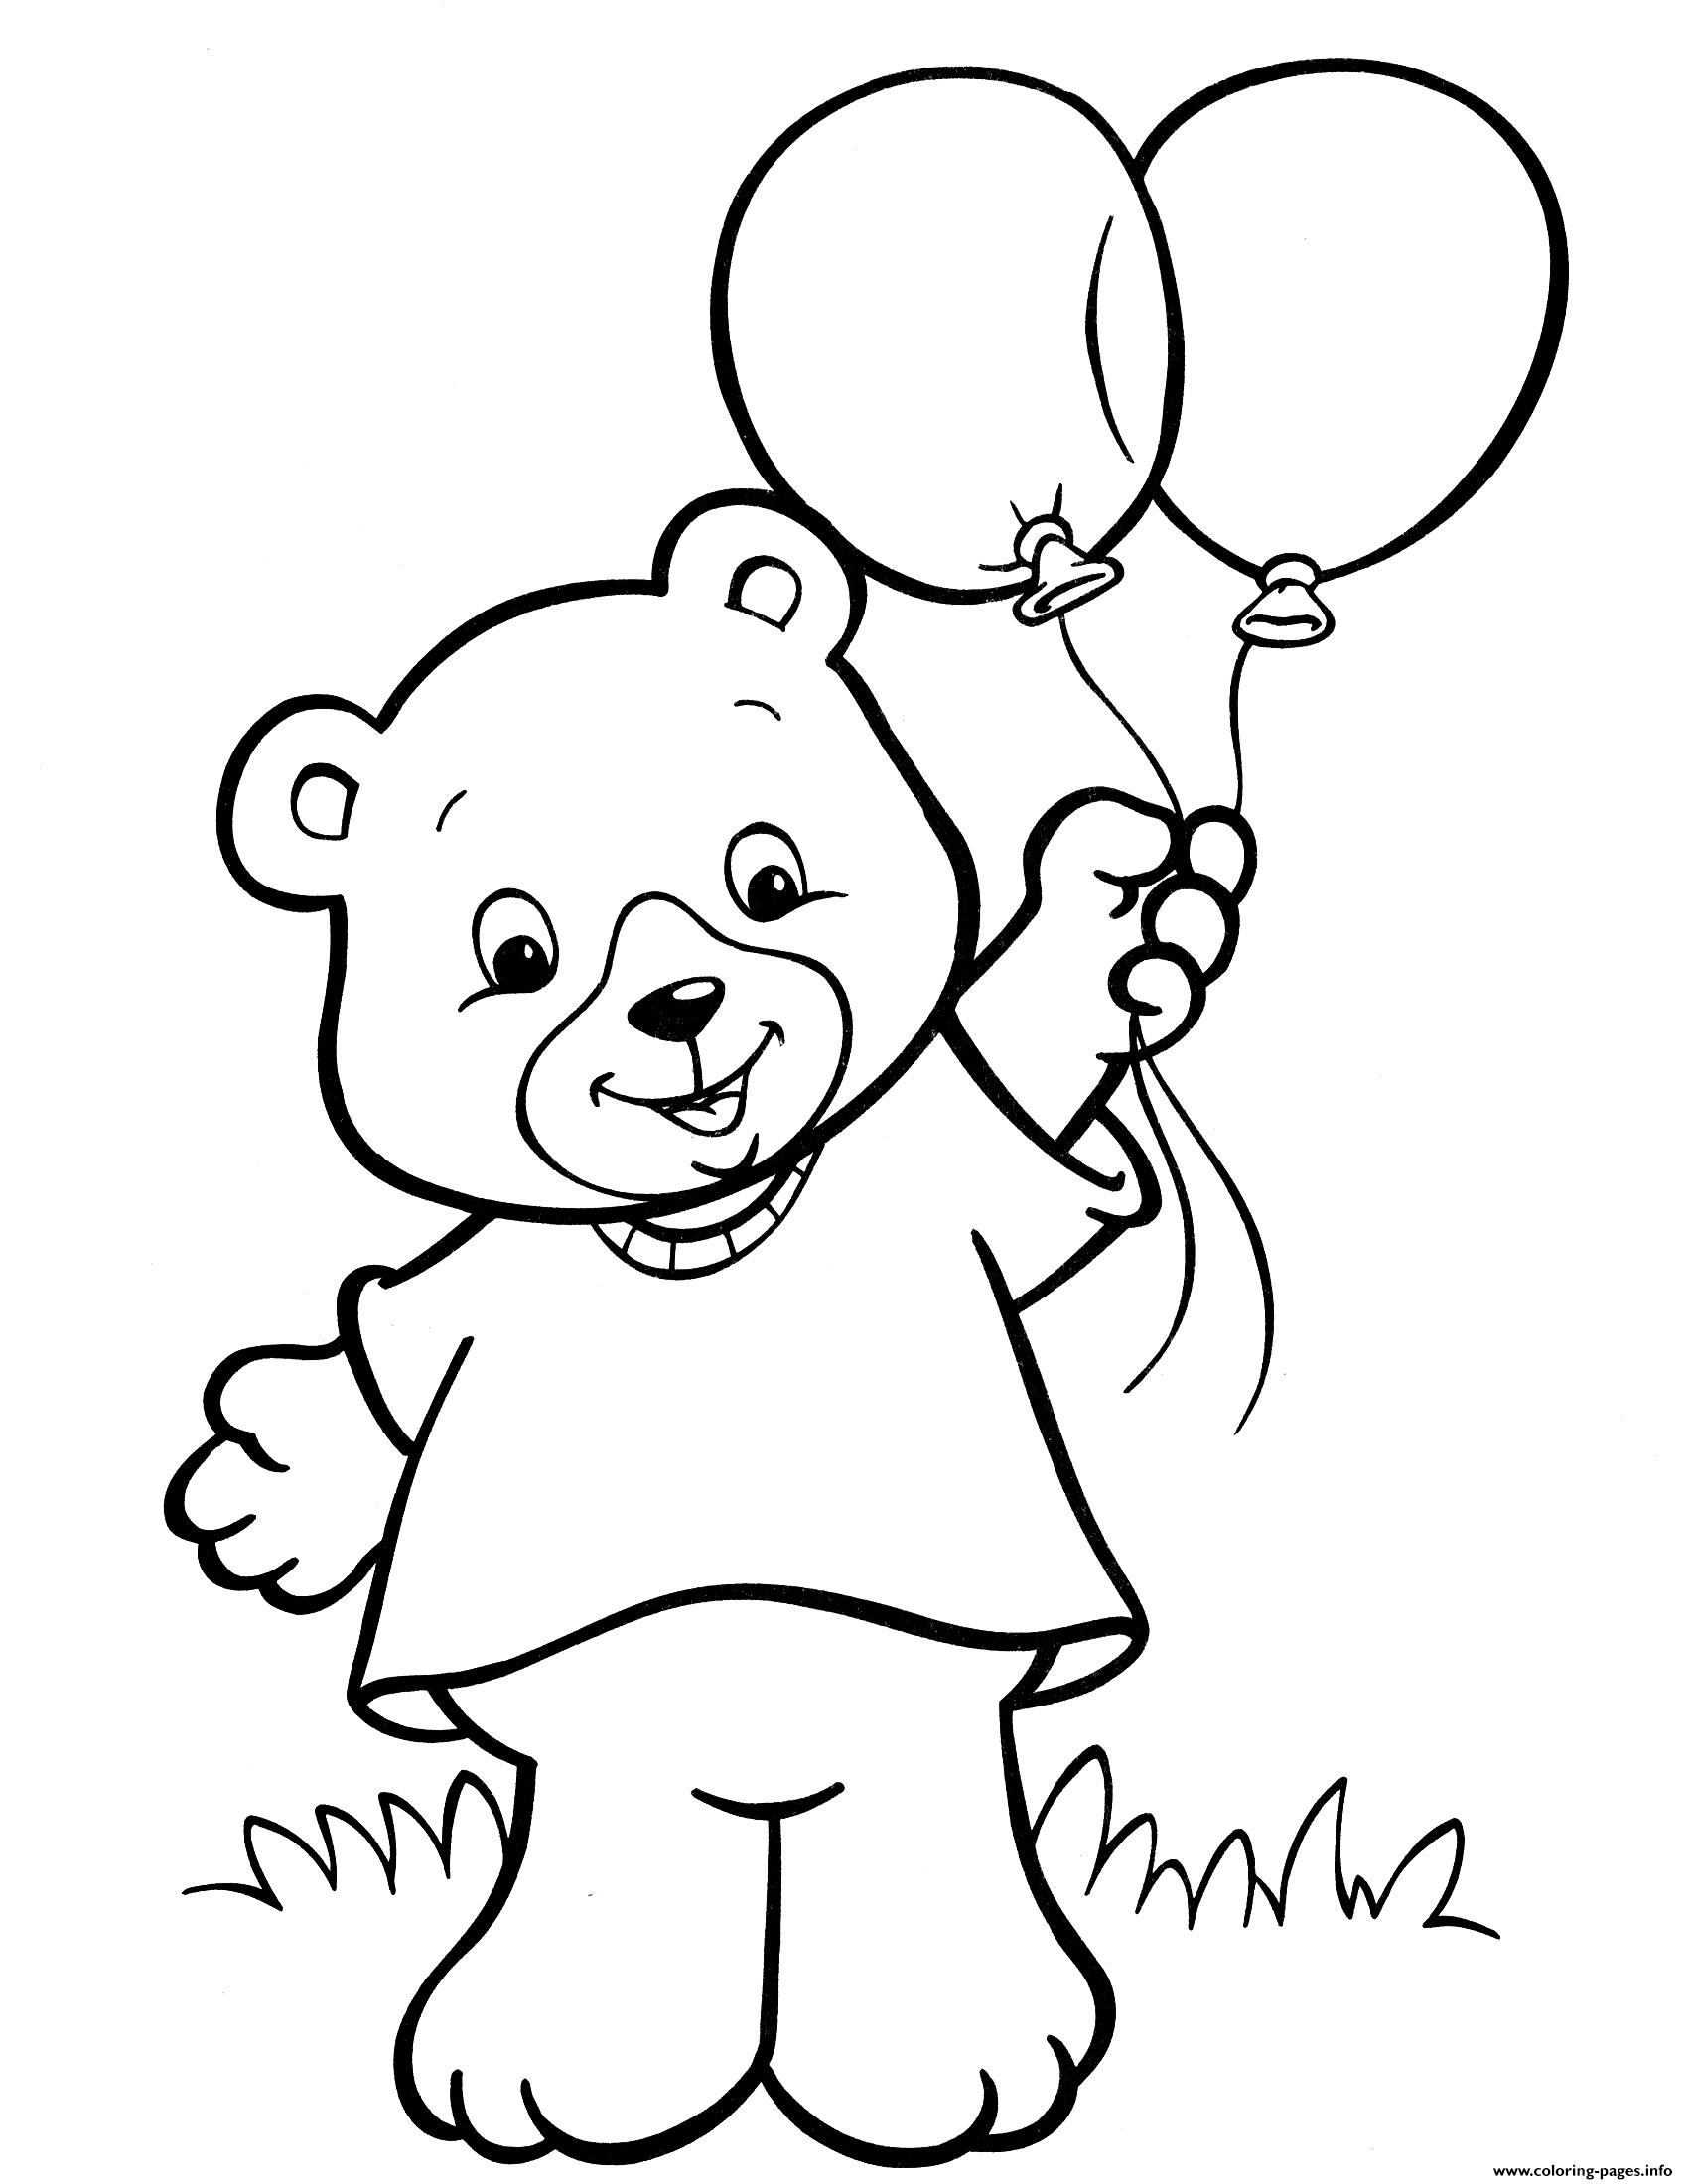 - Crayola Teddy Bear Balloon Coloring Pages Printable